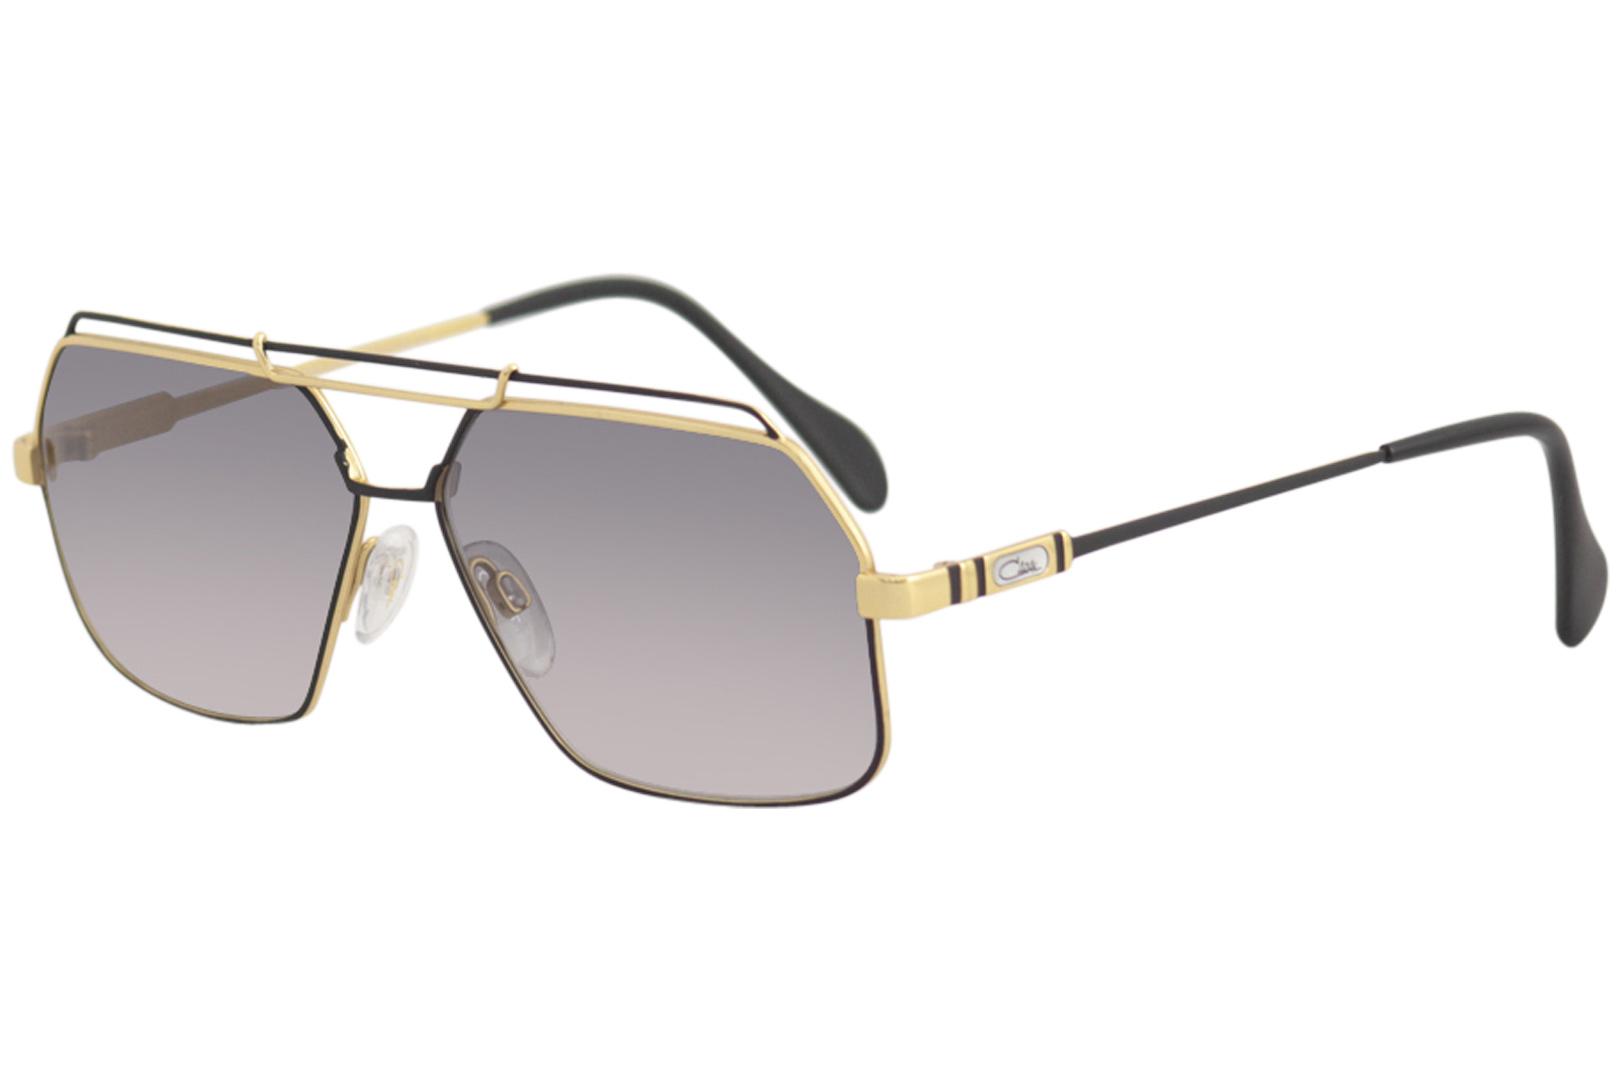 0716948ed0 Cazal Legends Men s 734 3 302SG Black-Gold Grey Fashion Pilot ...